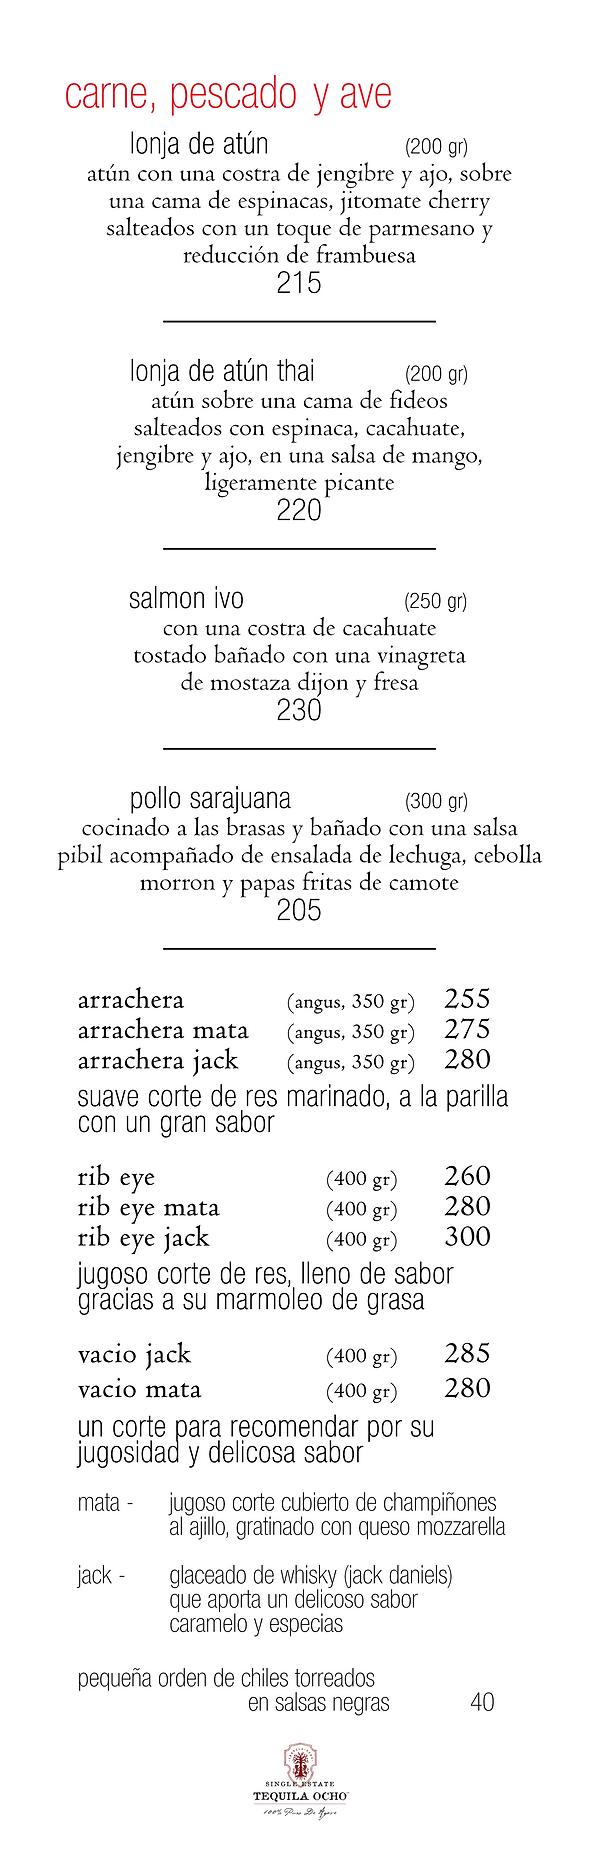 Page-6-Carne-Pescado.jpg.png